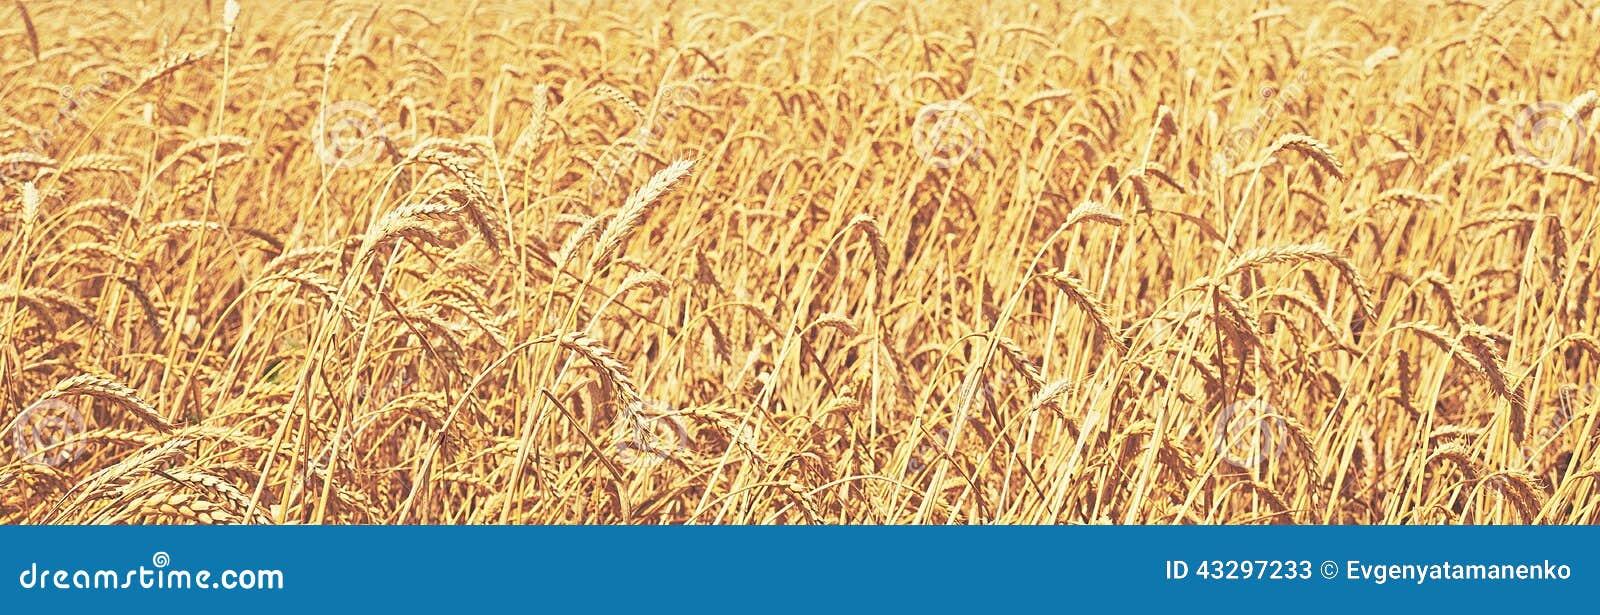 Zone de blé Fond naturel